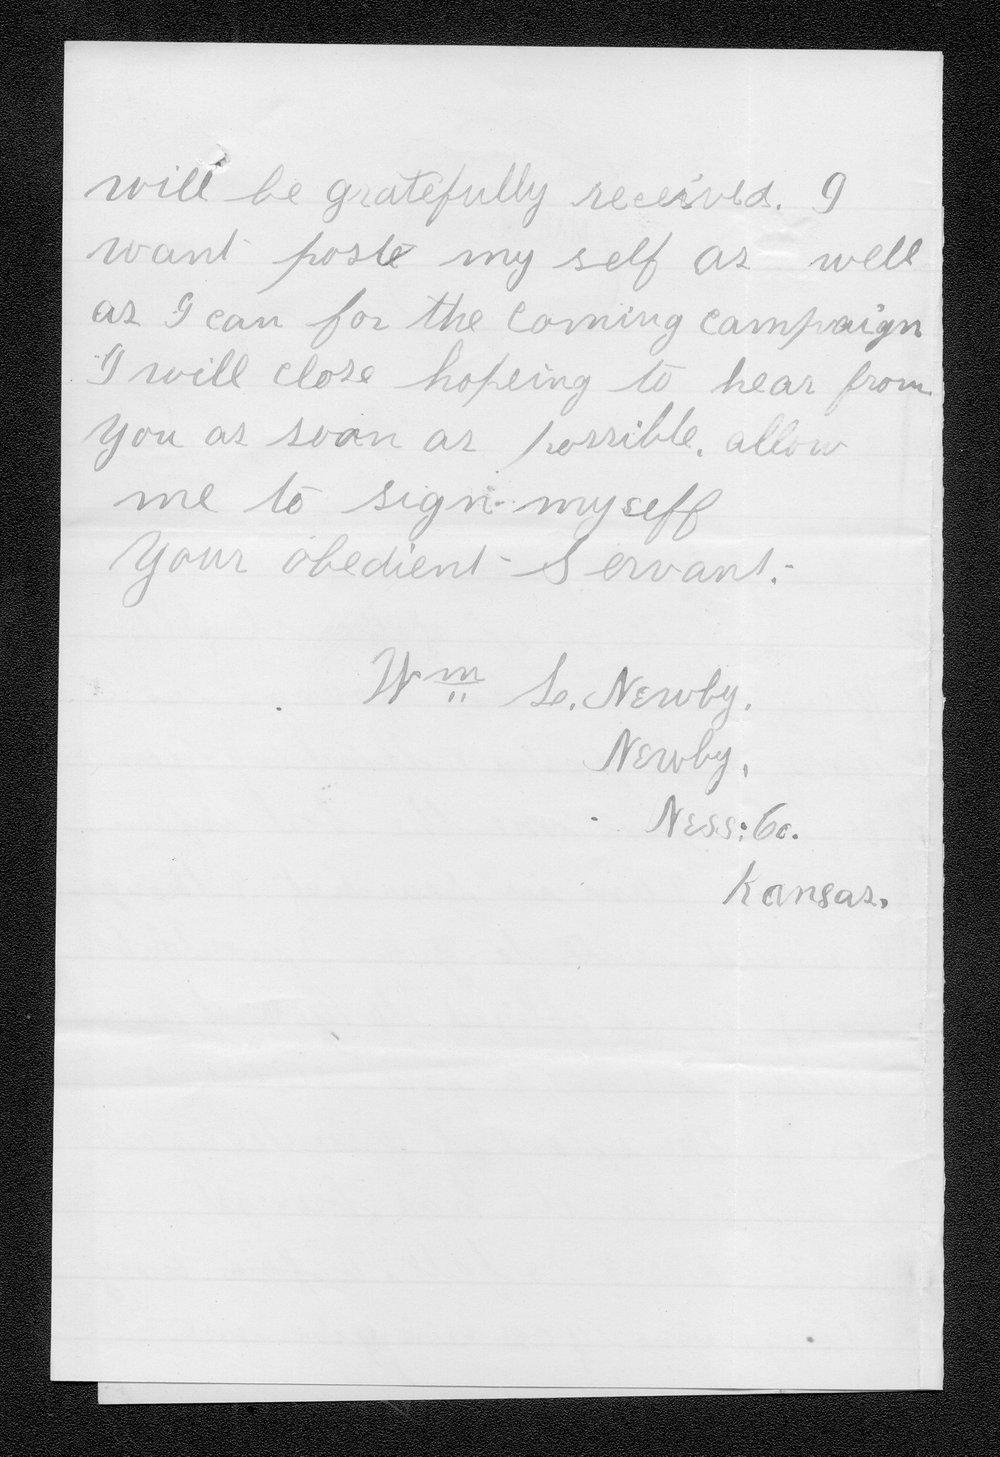 William S. Newby to Governor John St. John - 2